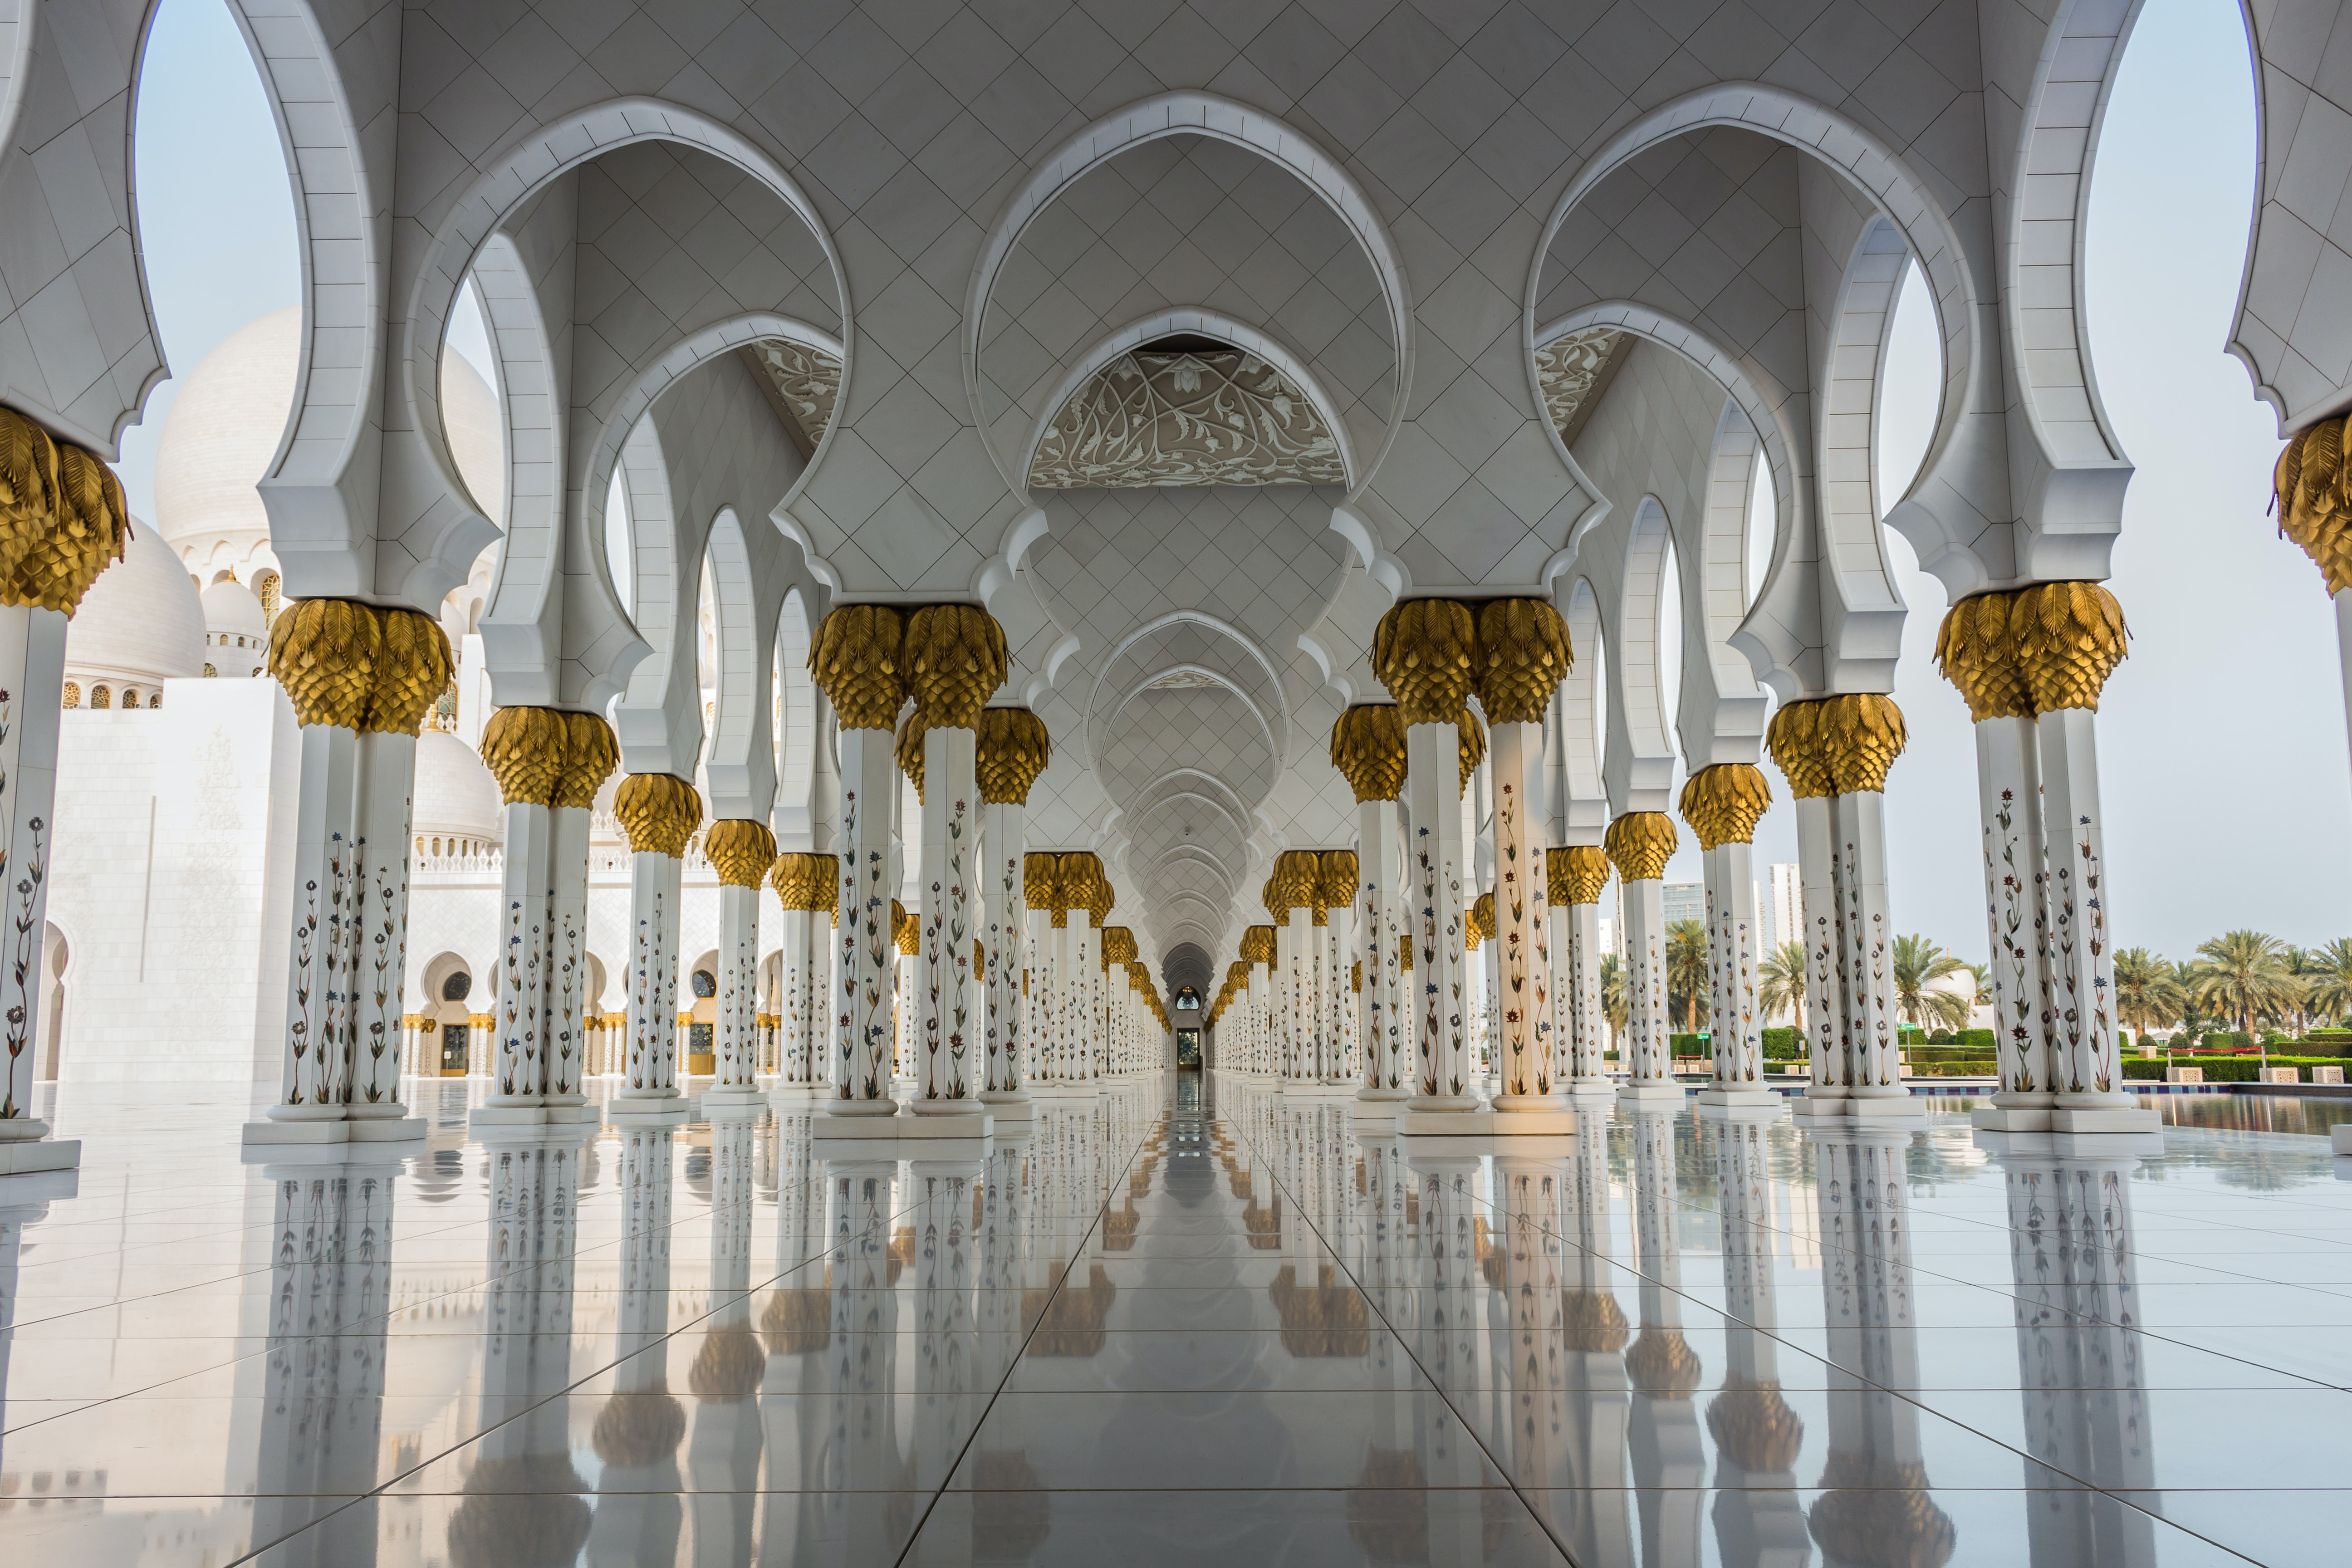 tile flooring between white pillars